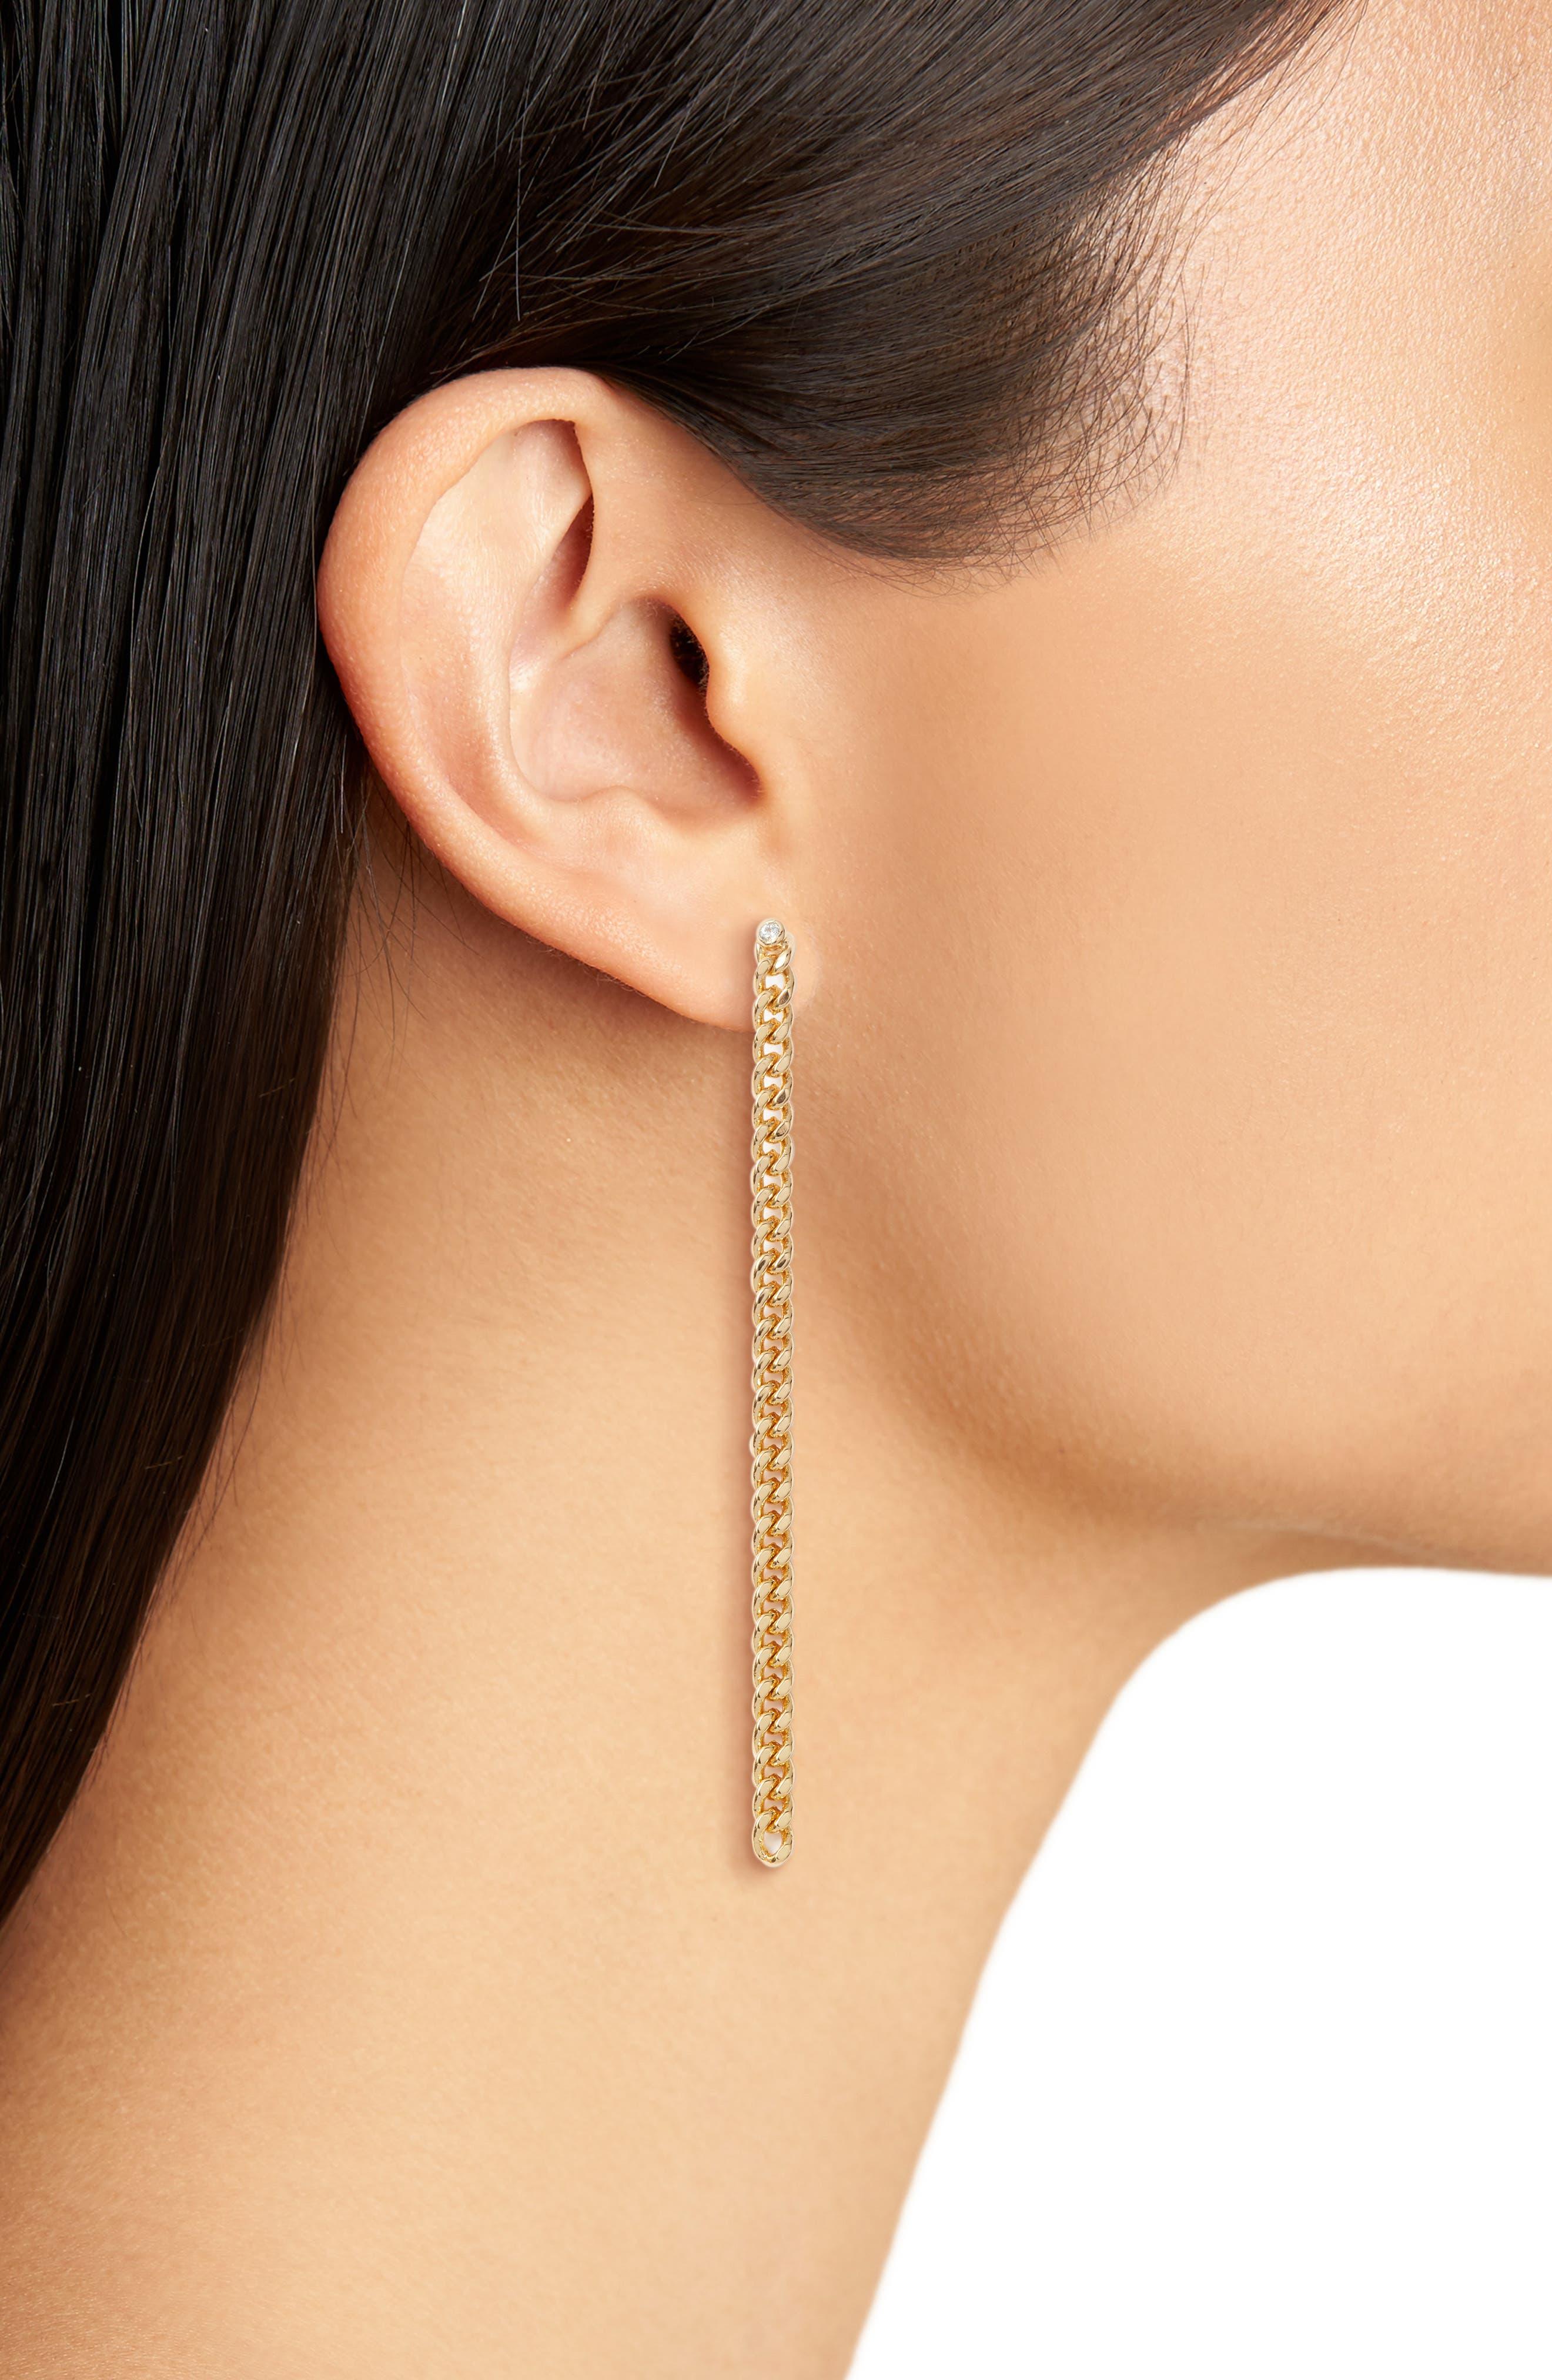 Bodhi Drop Earrings,                             Alternate thumbnail 2, color,                             710